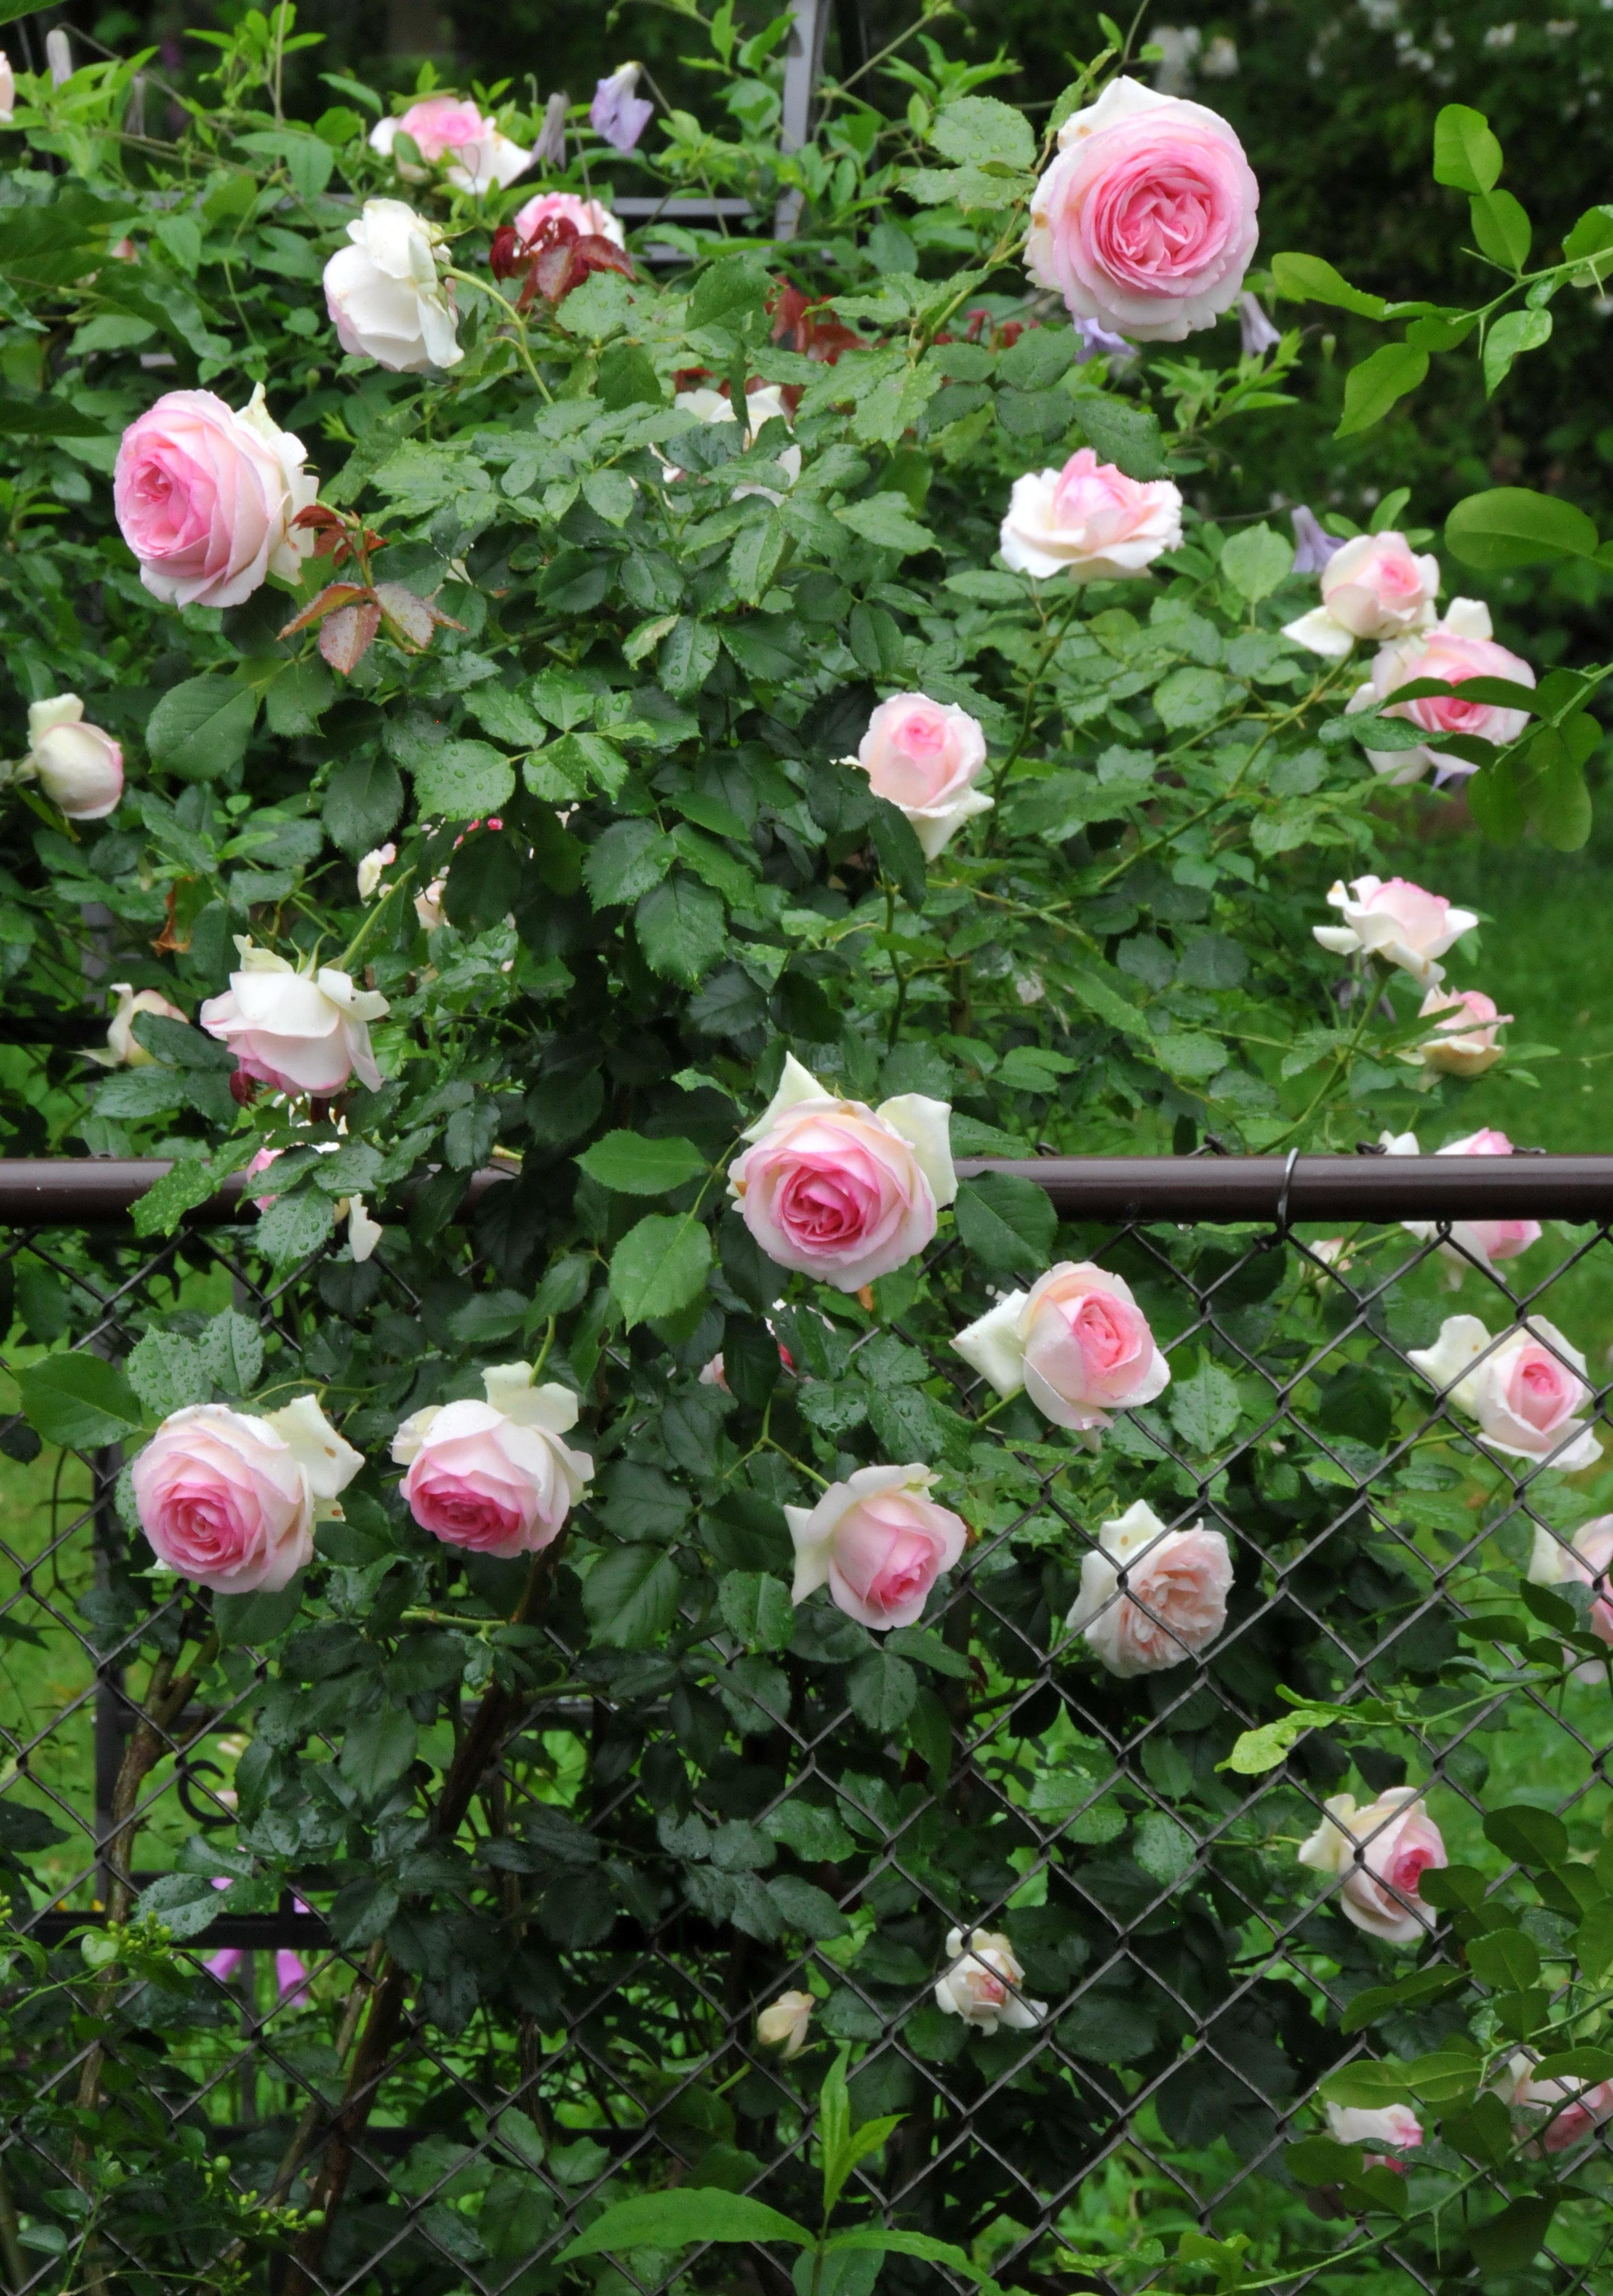 1000 images about david austin roses on pinterest gardens shrub roses and christopher marlowe. Black Bedroom Furniture Sets. Home Design Ideas